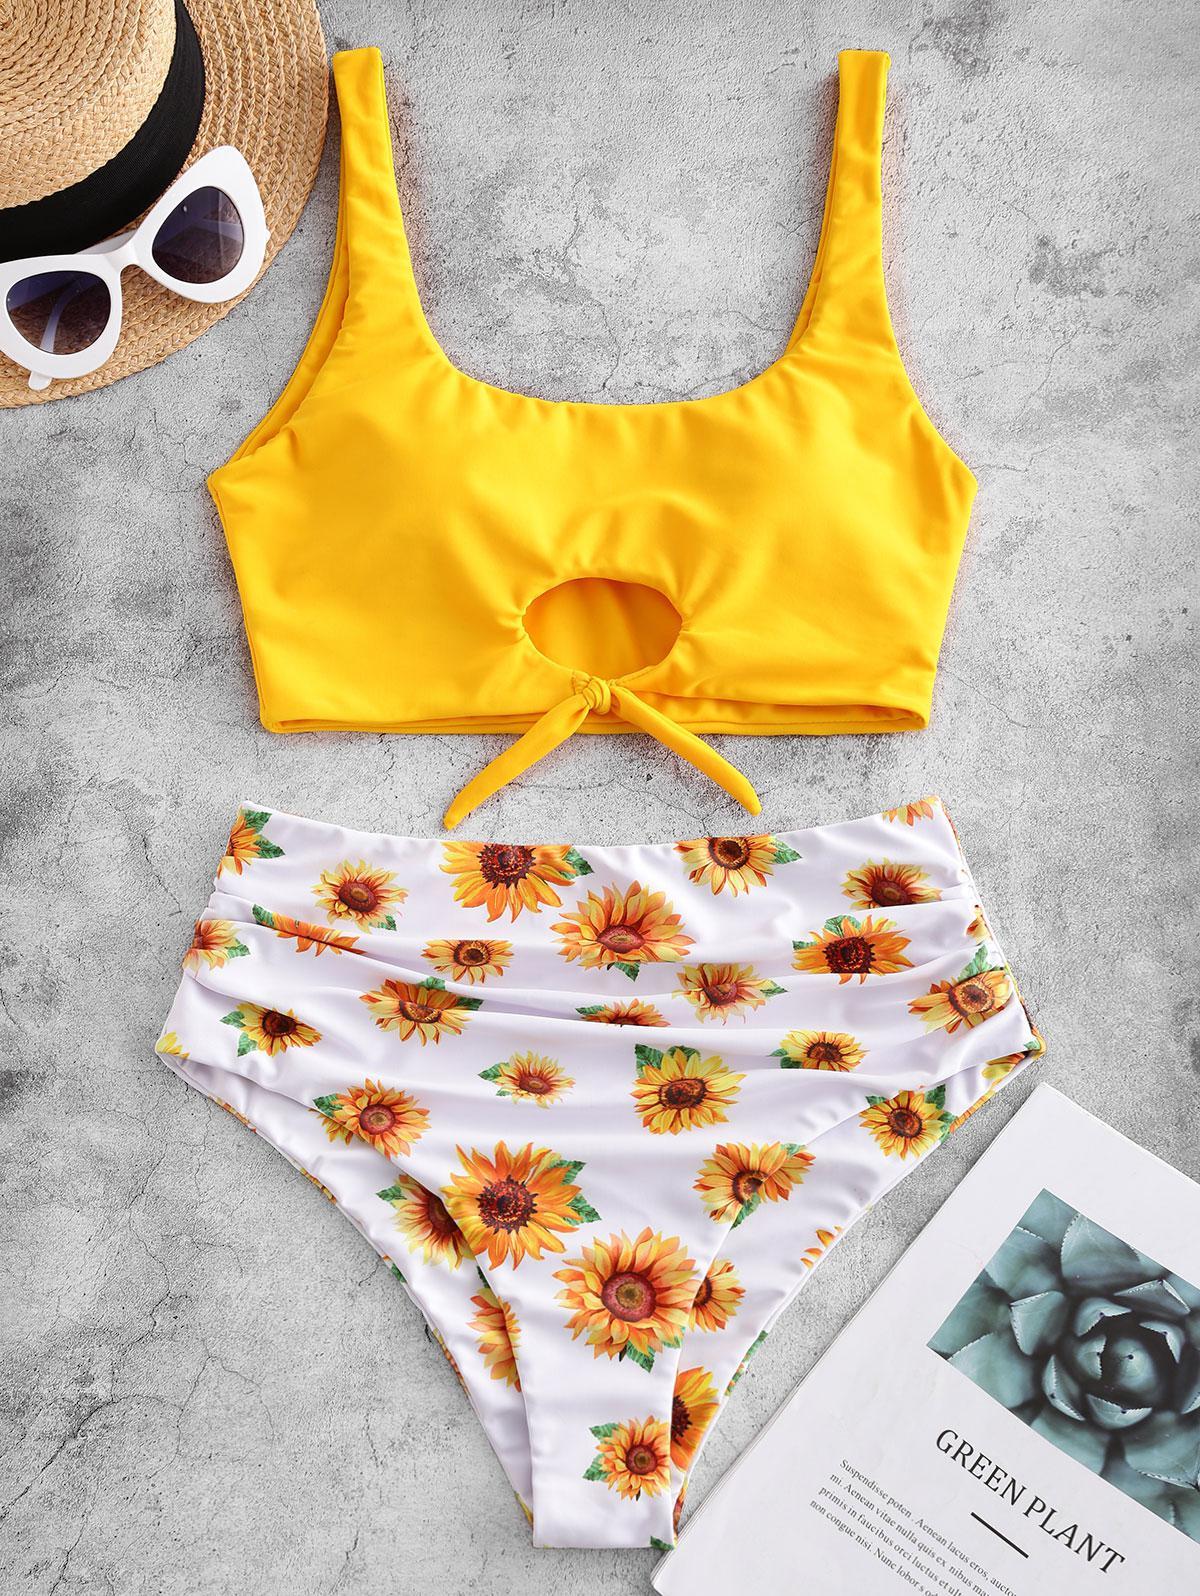 ZAFUL Sunflower High Cut Ruched Knot Tankini Swimsuit фото